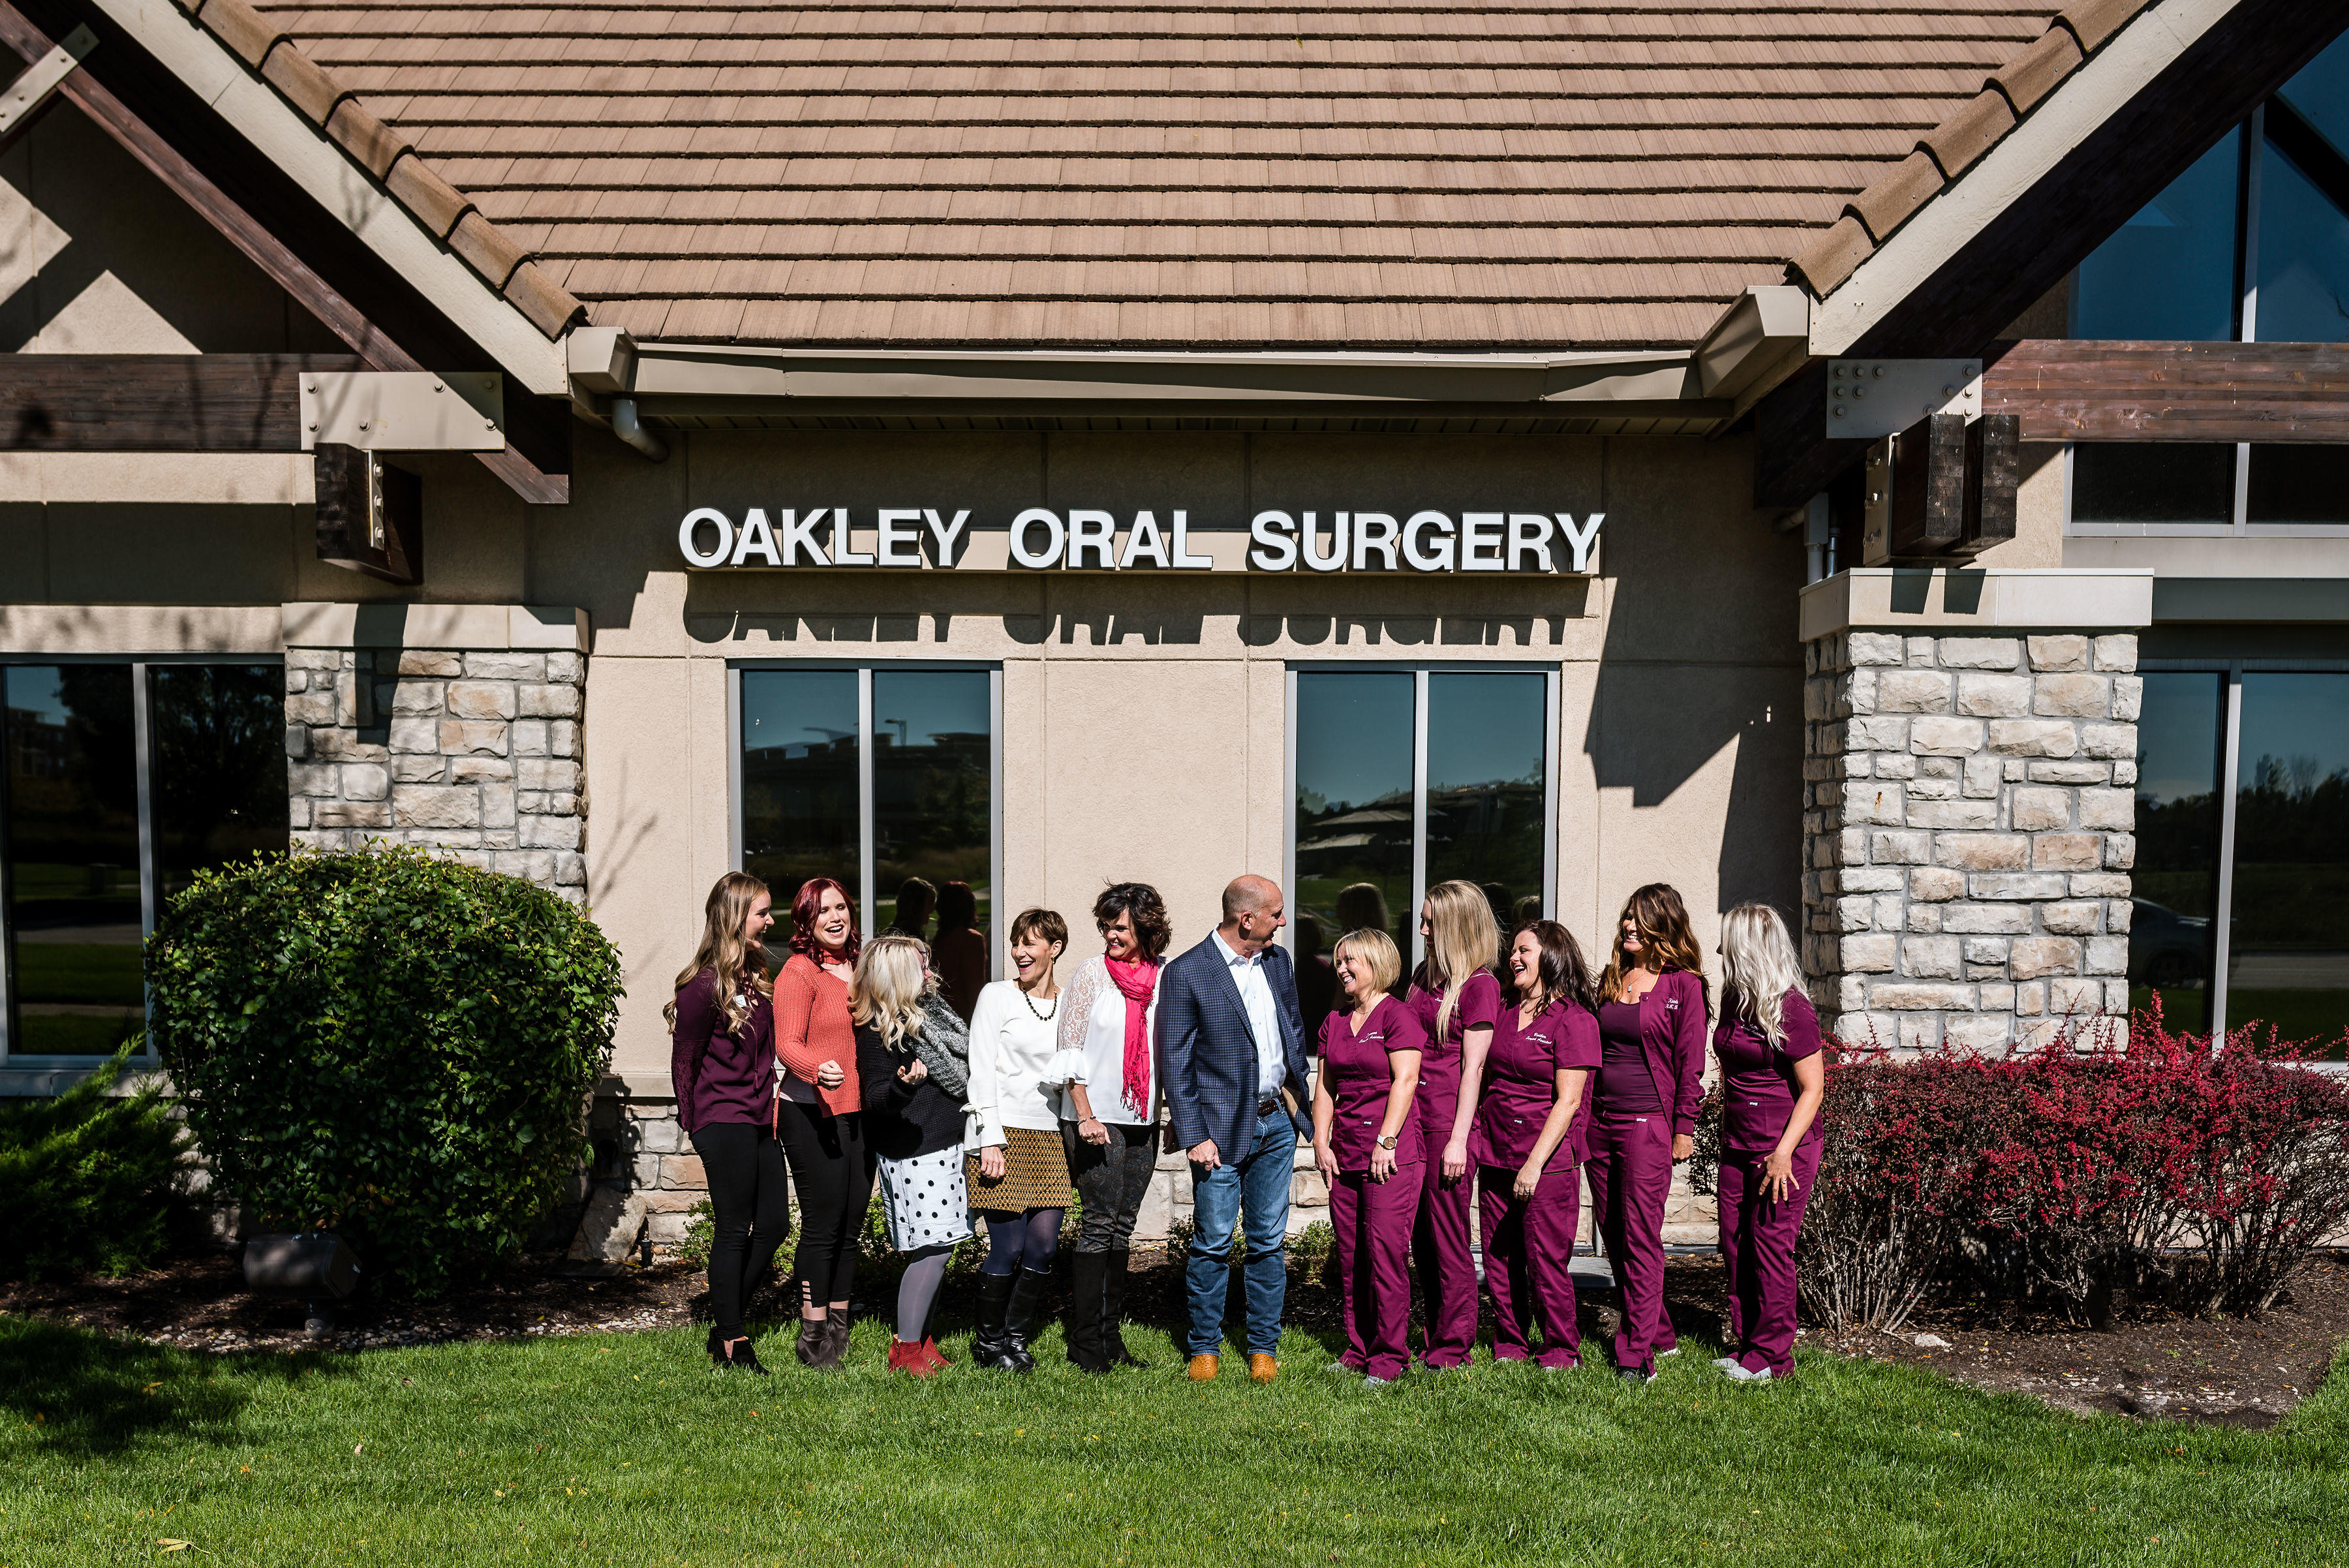 Oakley Oral Surgery - Richard M. Oakley image 3